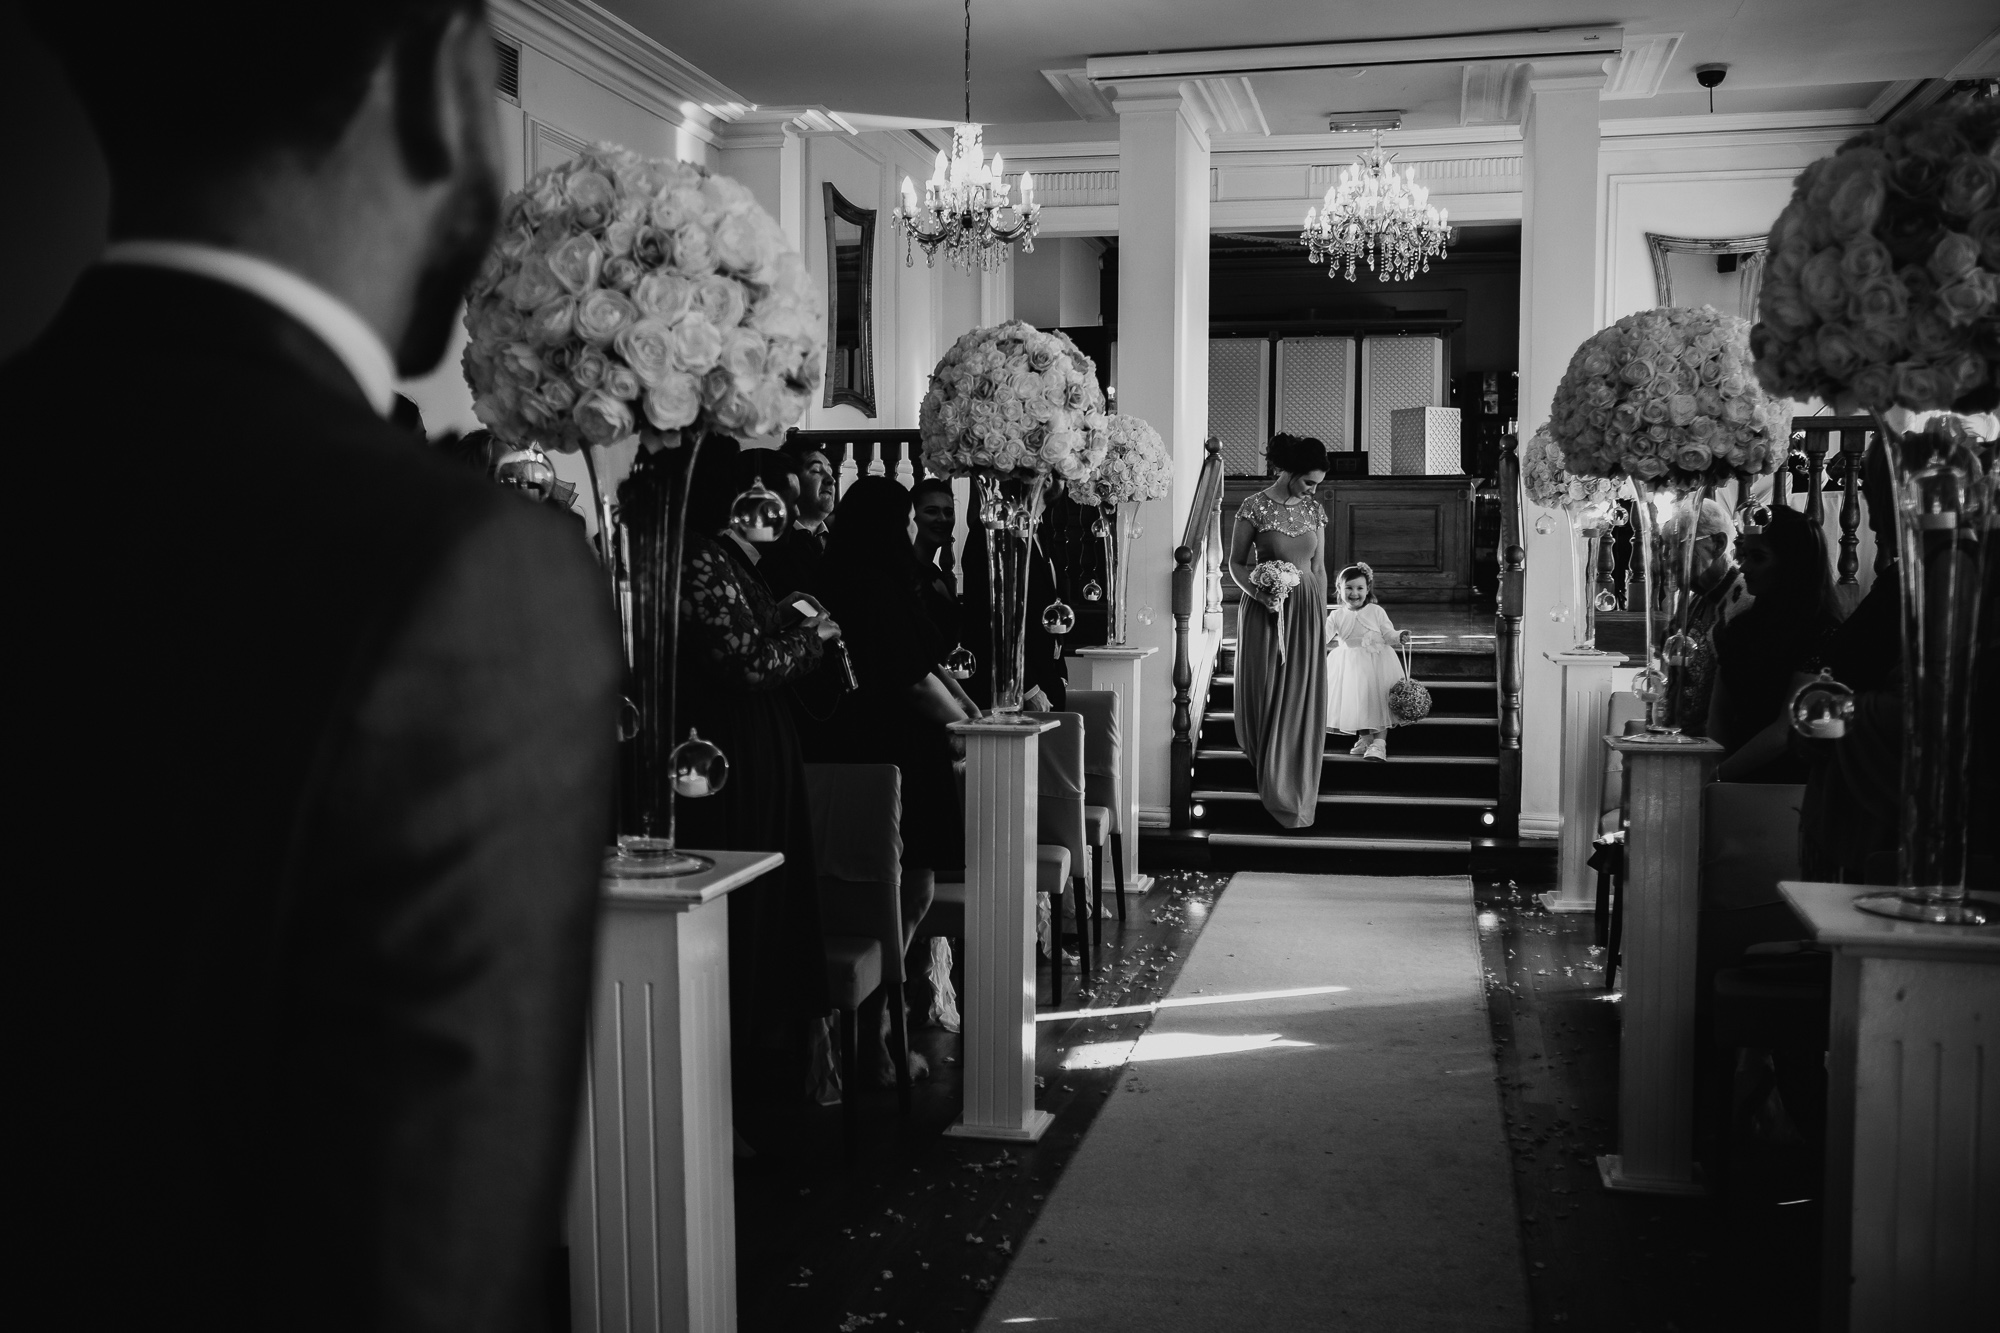 West Tower Exclusive Wedding Venue wedding photography merseyside and lancashire wedding photographer (24 of 60).jpg